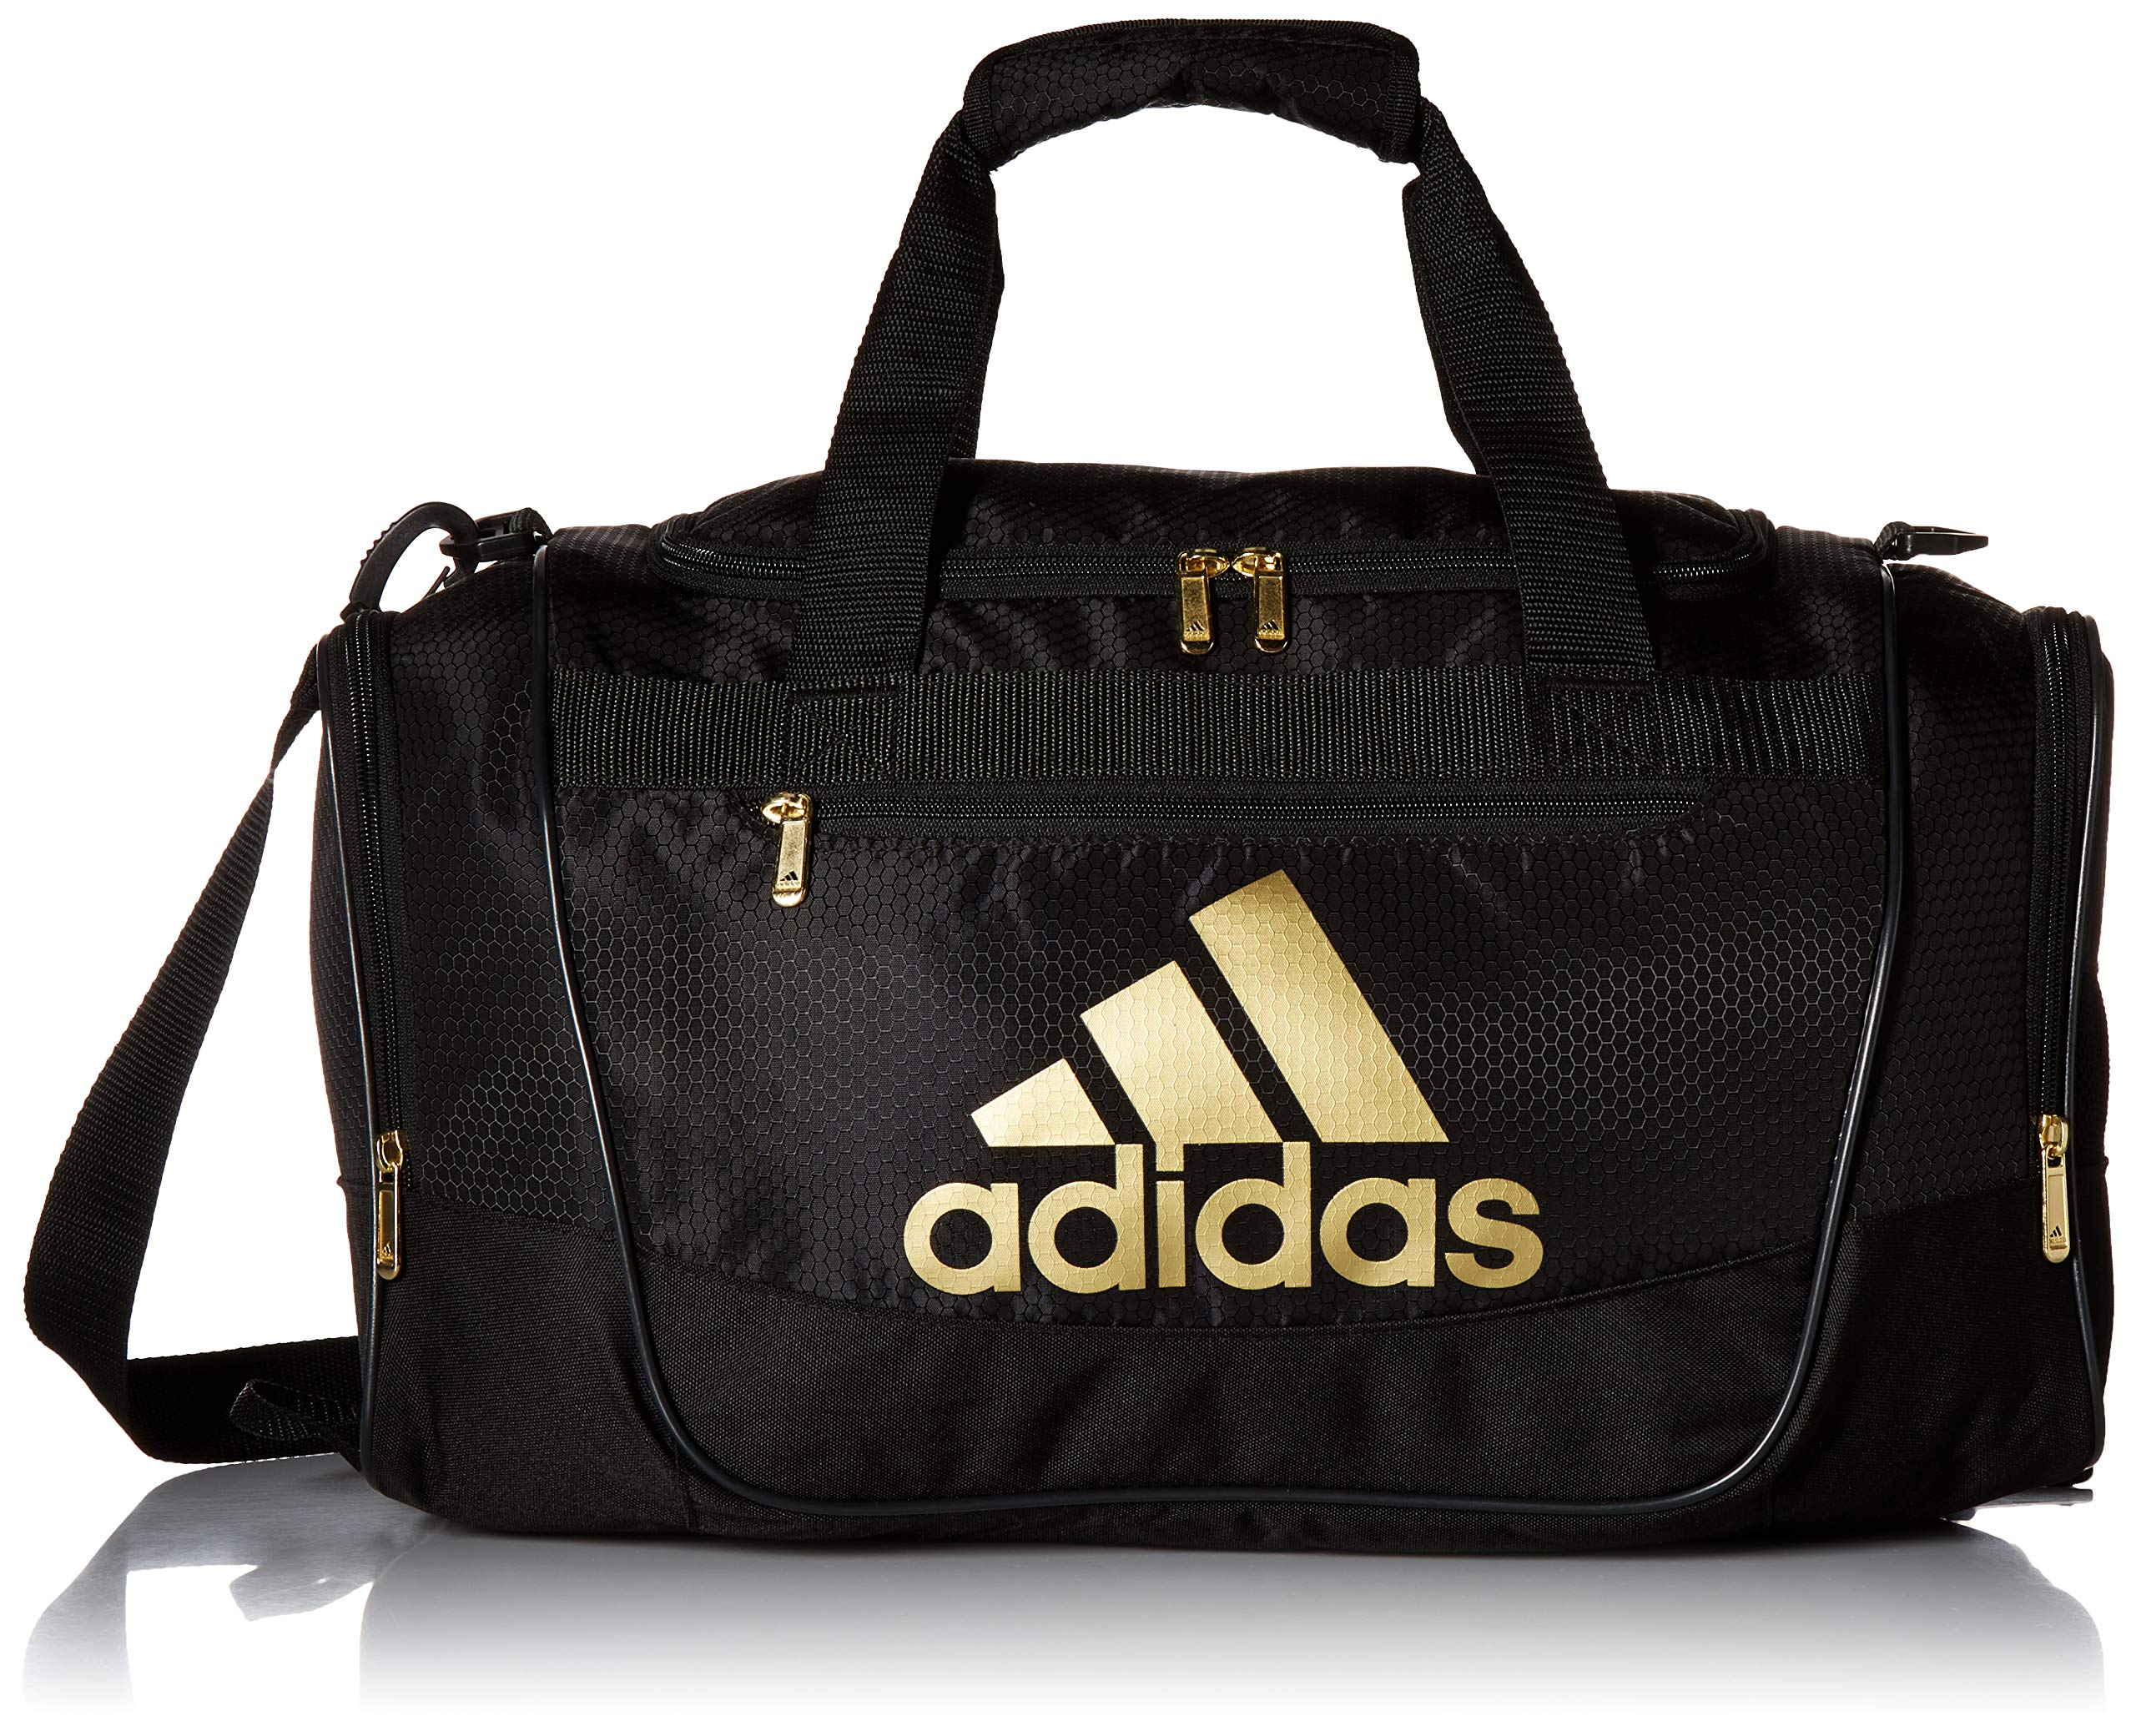 adidas Defender Iii Small Duffel, Black/Gold, One Size